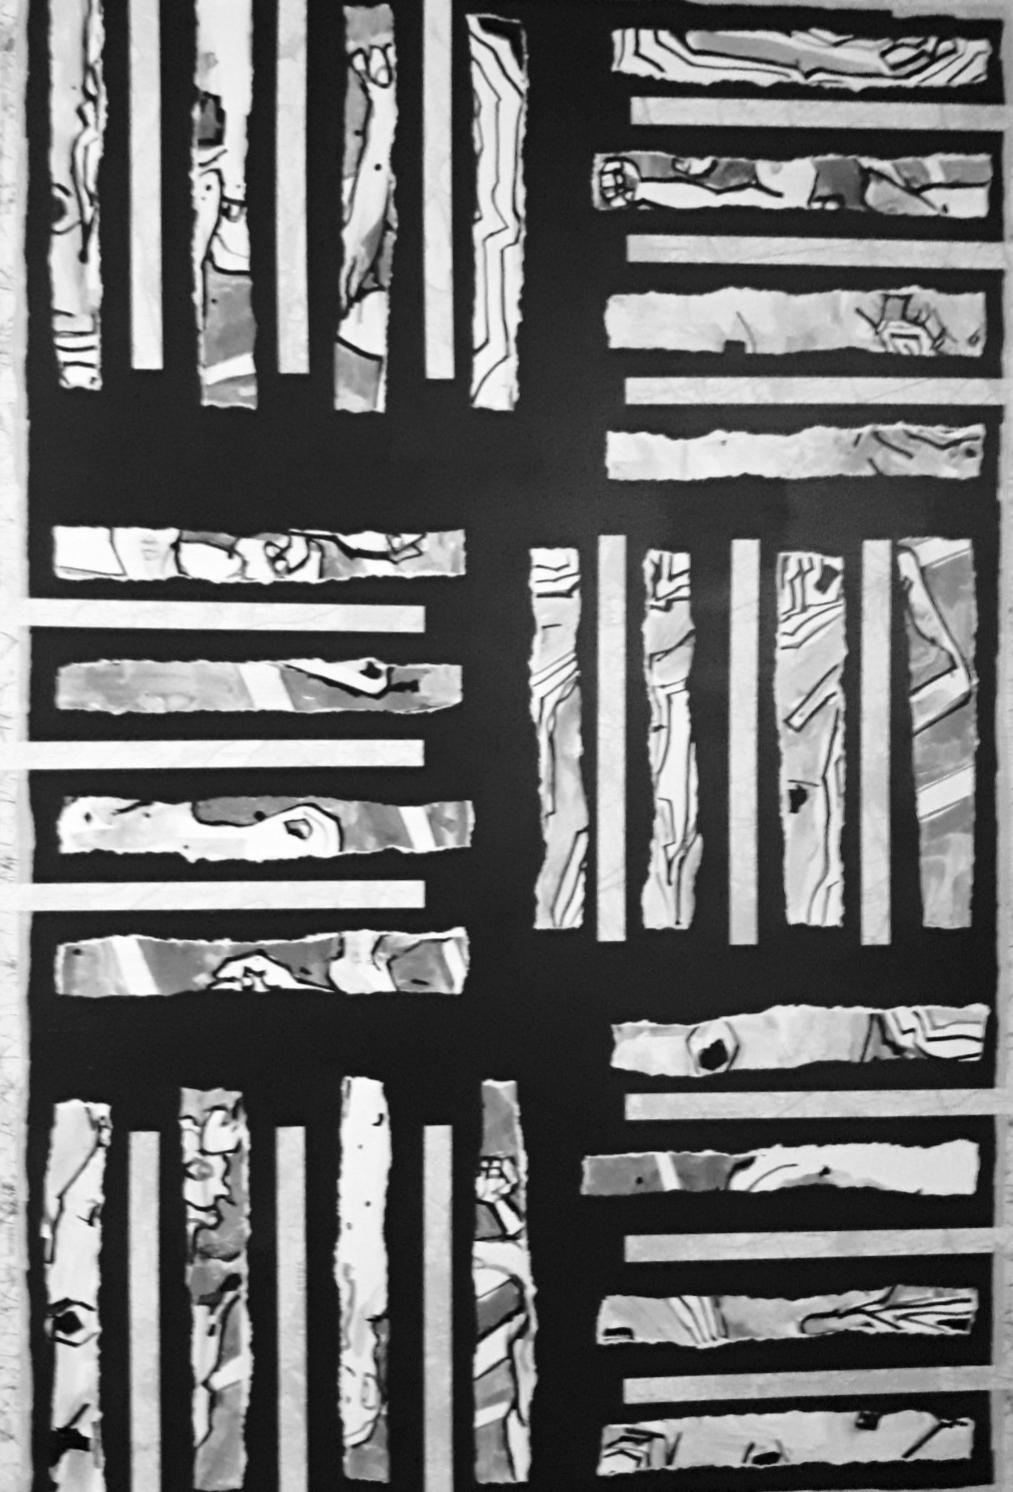 Atelier Klaver Jos van der Wedden collages